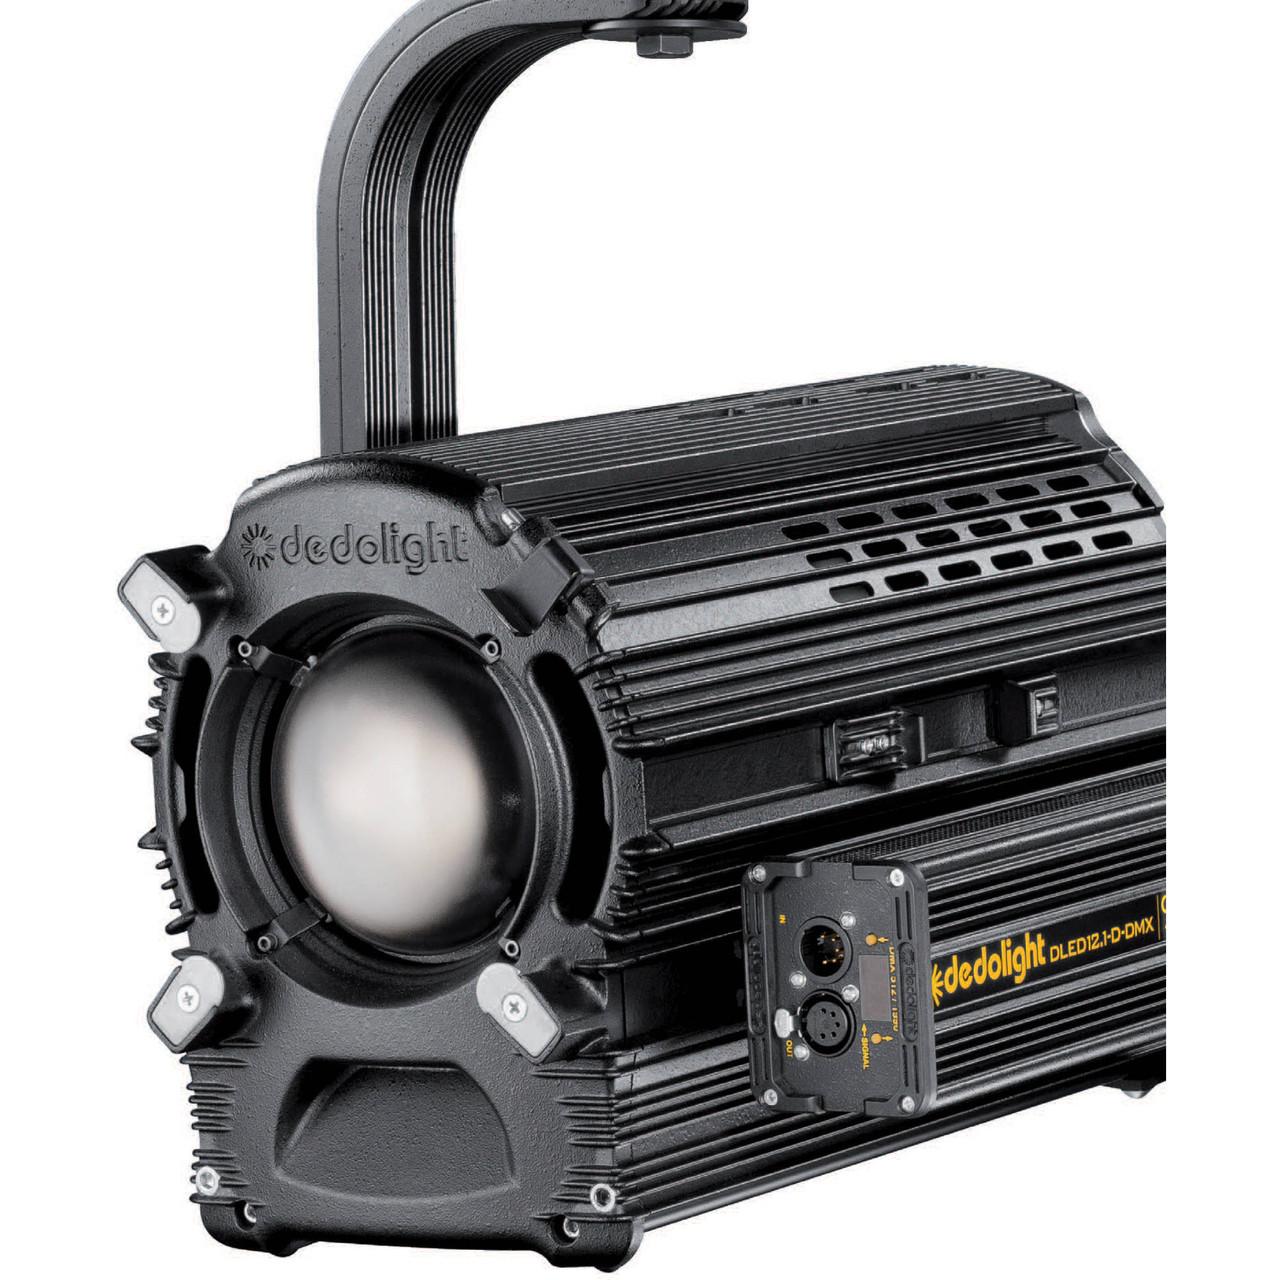 Dedolight DLED12.1-T-DMX Tungsten LED Light Head (DLED12-T-DMX)